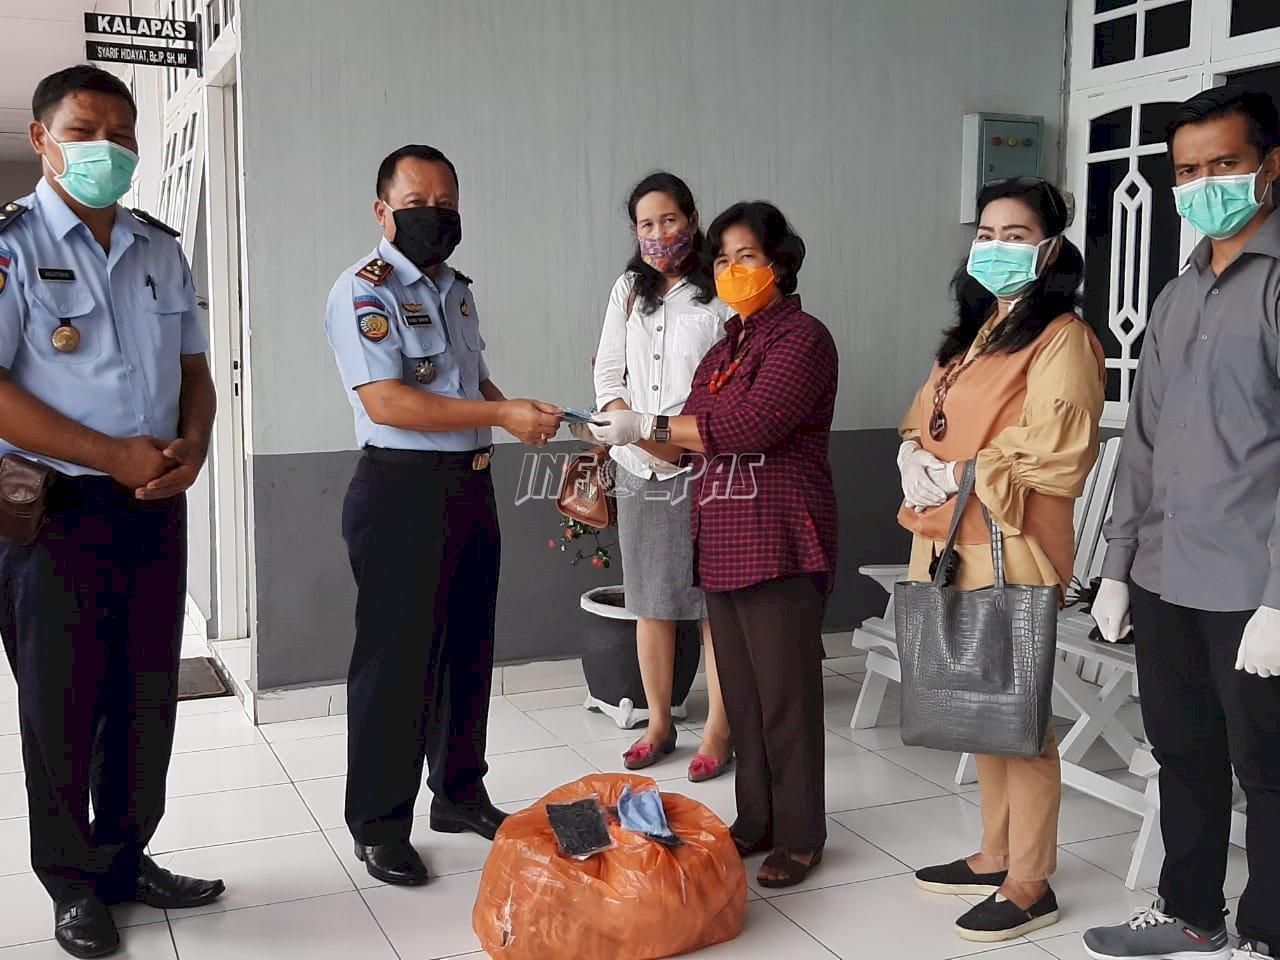 700 Masker Dibagikan Untuk WBP Lapas Palangka Raya